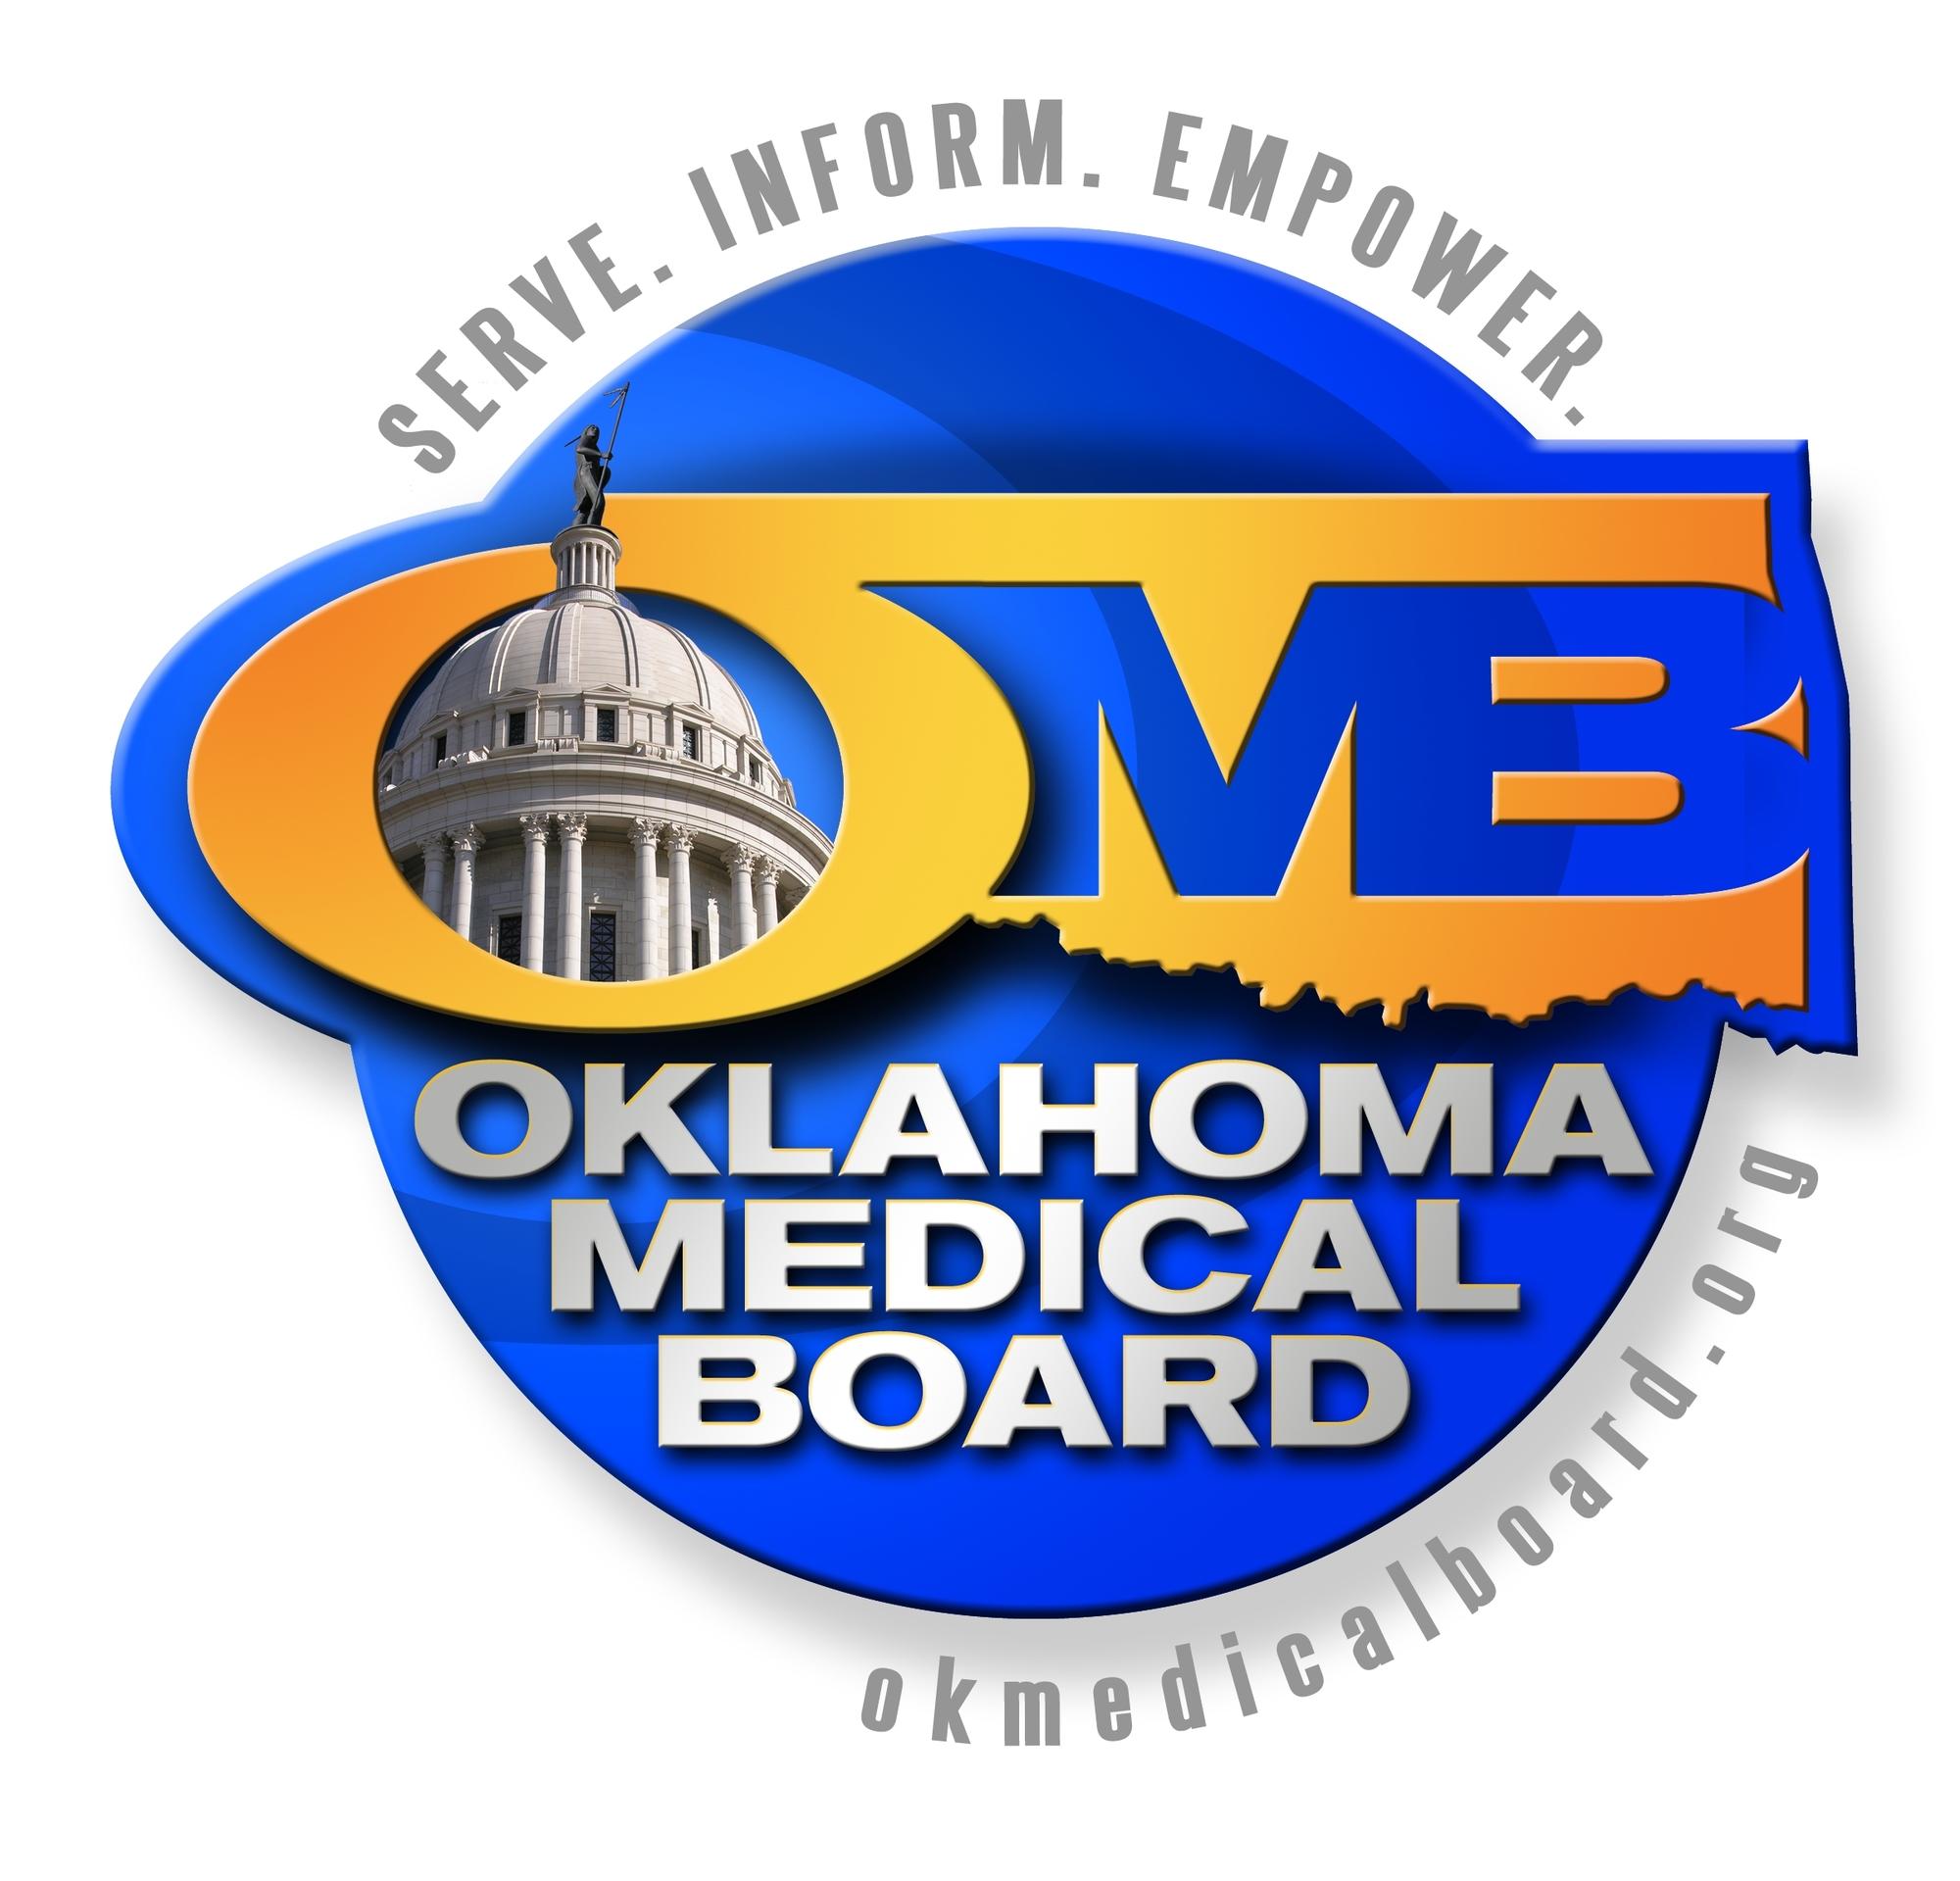 oklahoma medical board